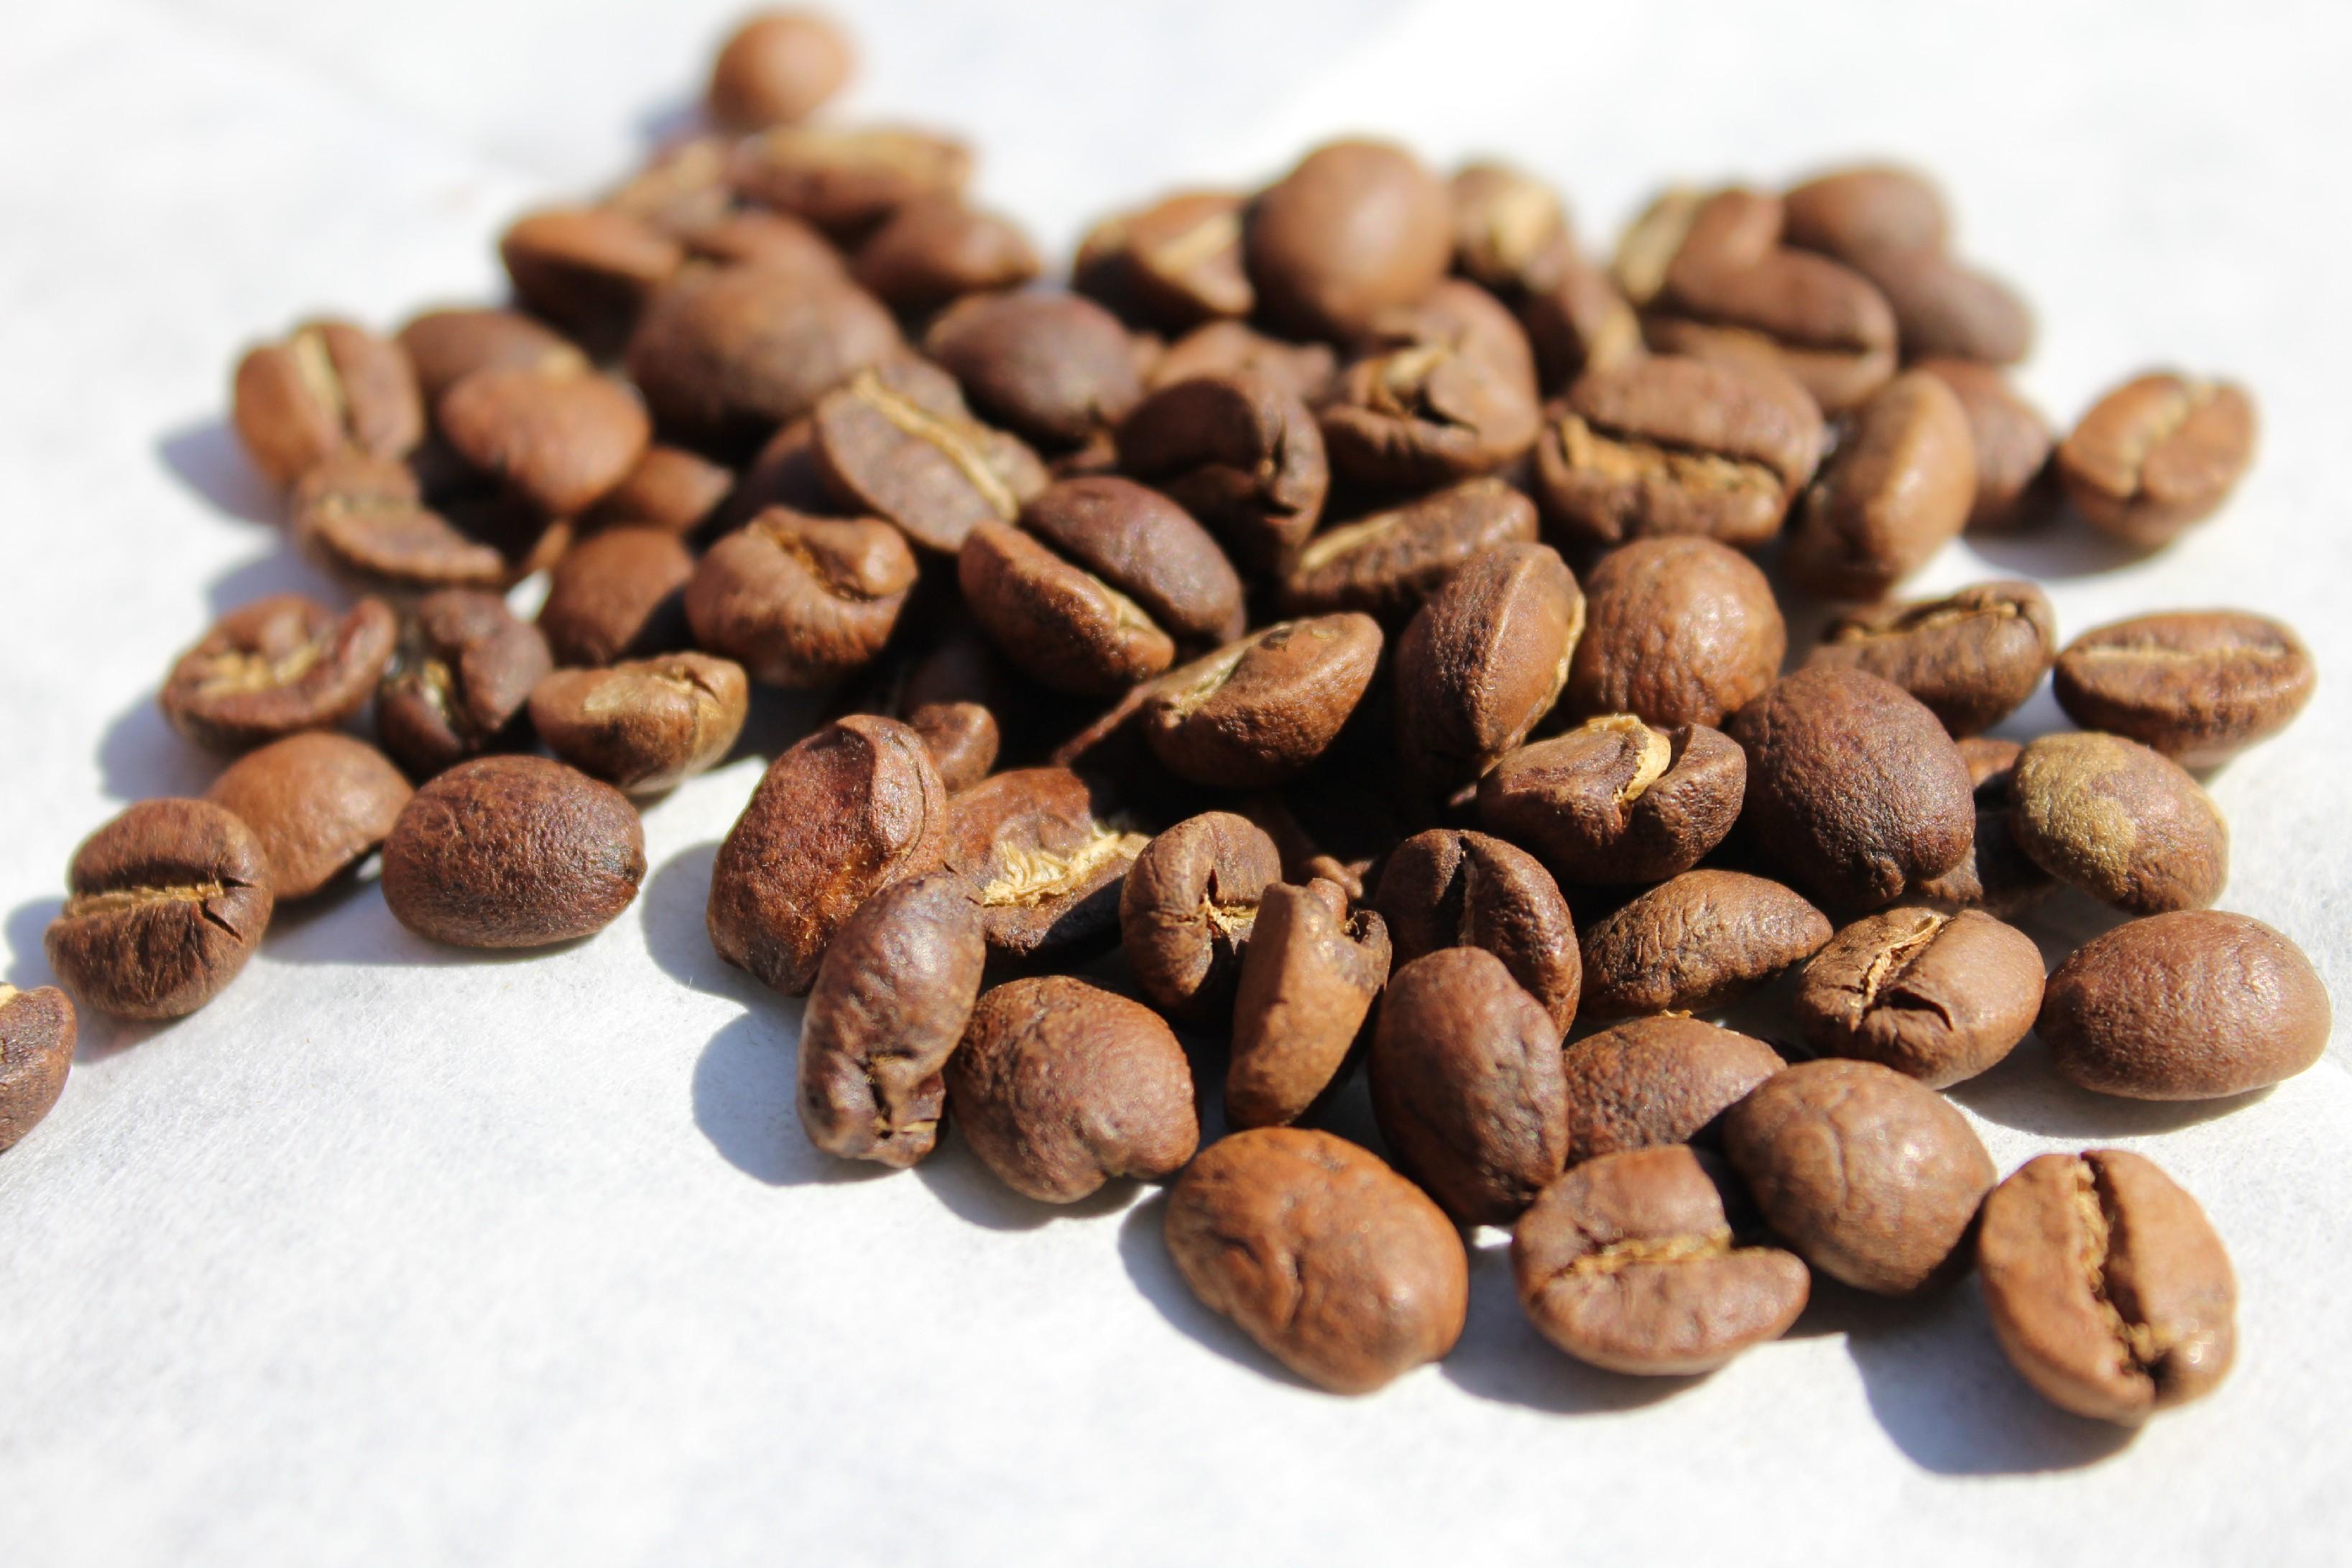 BotaCoffee Tanzania AA Top Songwa Estates (250g) Mletí kávy: Zrnková